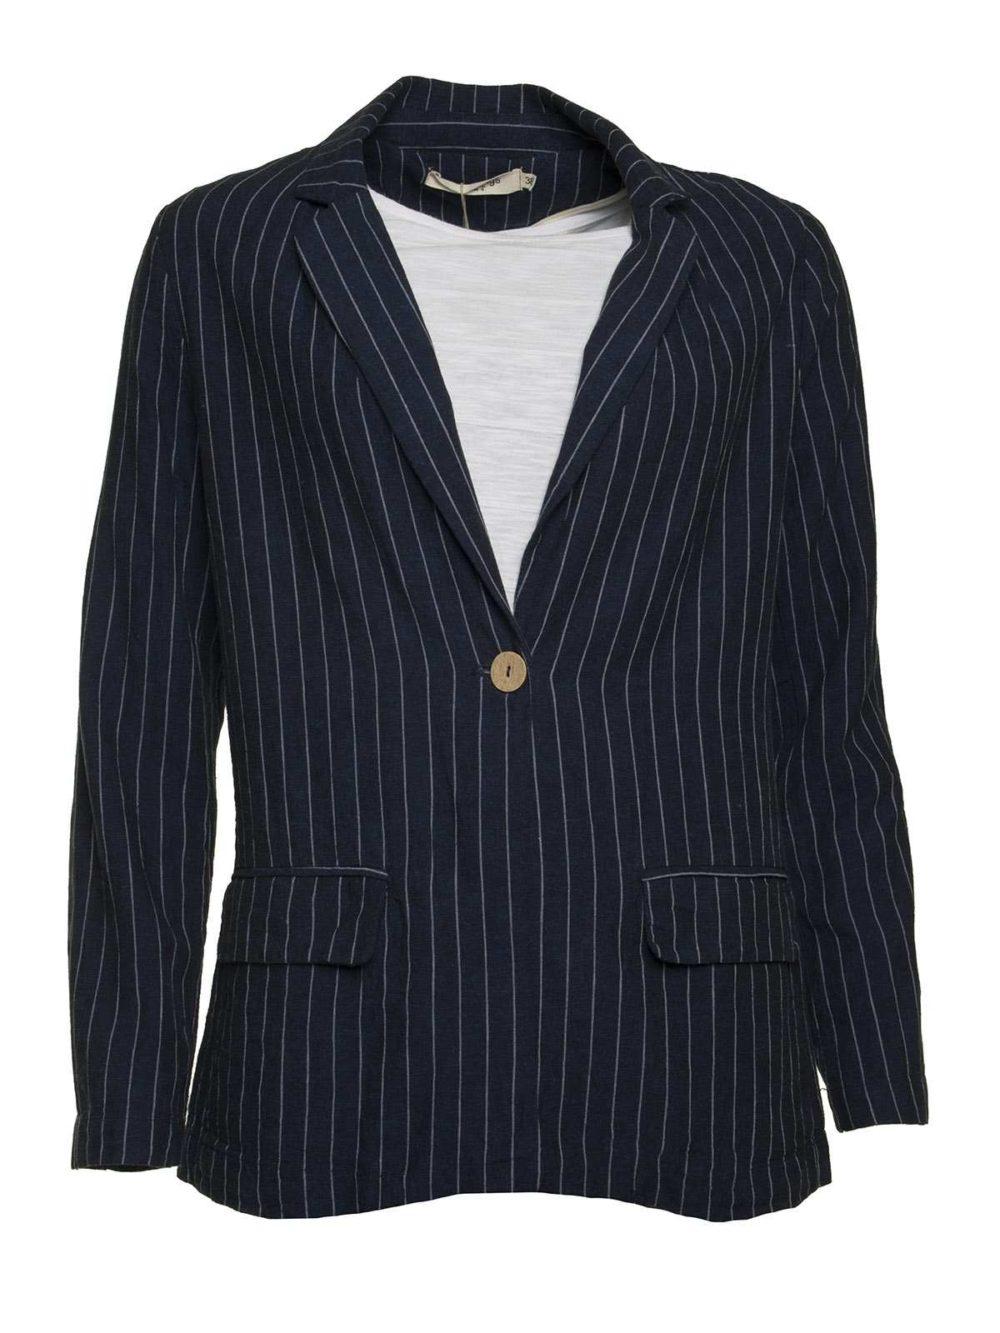 Linen Striped Blazer Nice Things Katie Kerr Women's Clothing